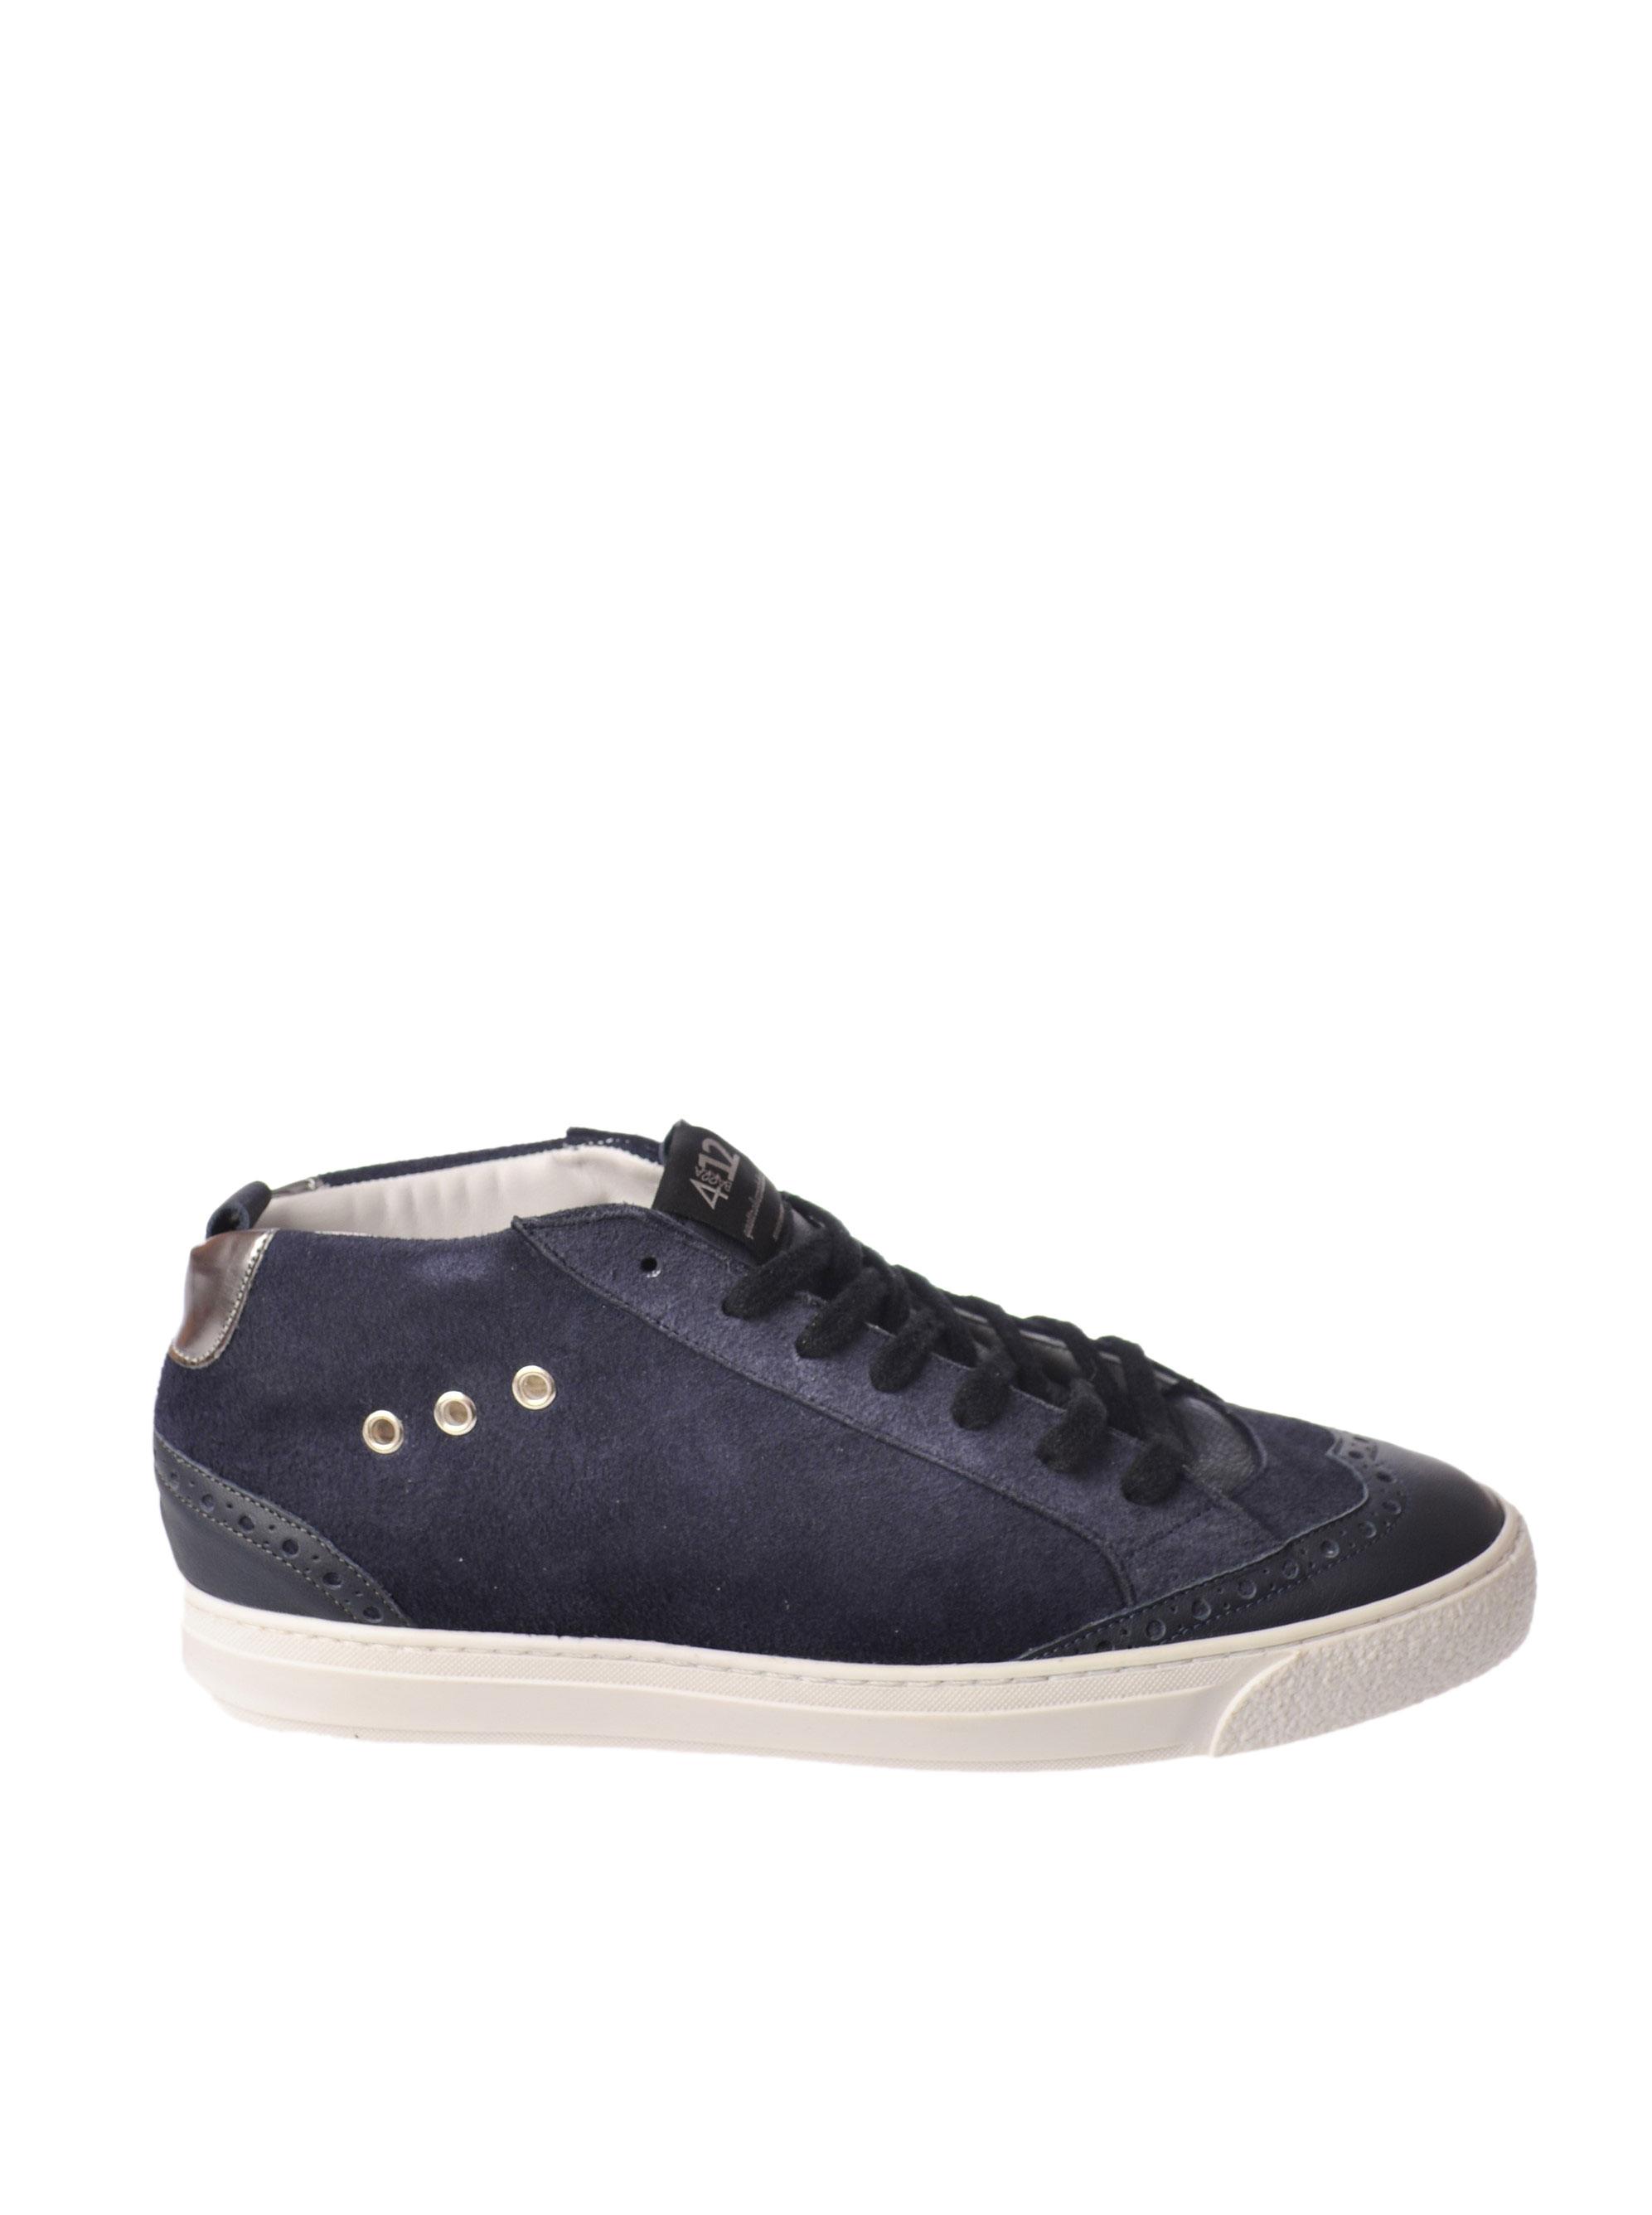 Quattrobarradodici - Sneakers